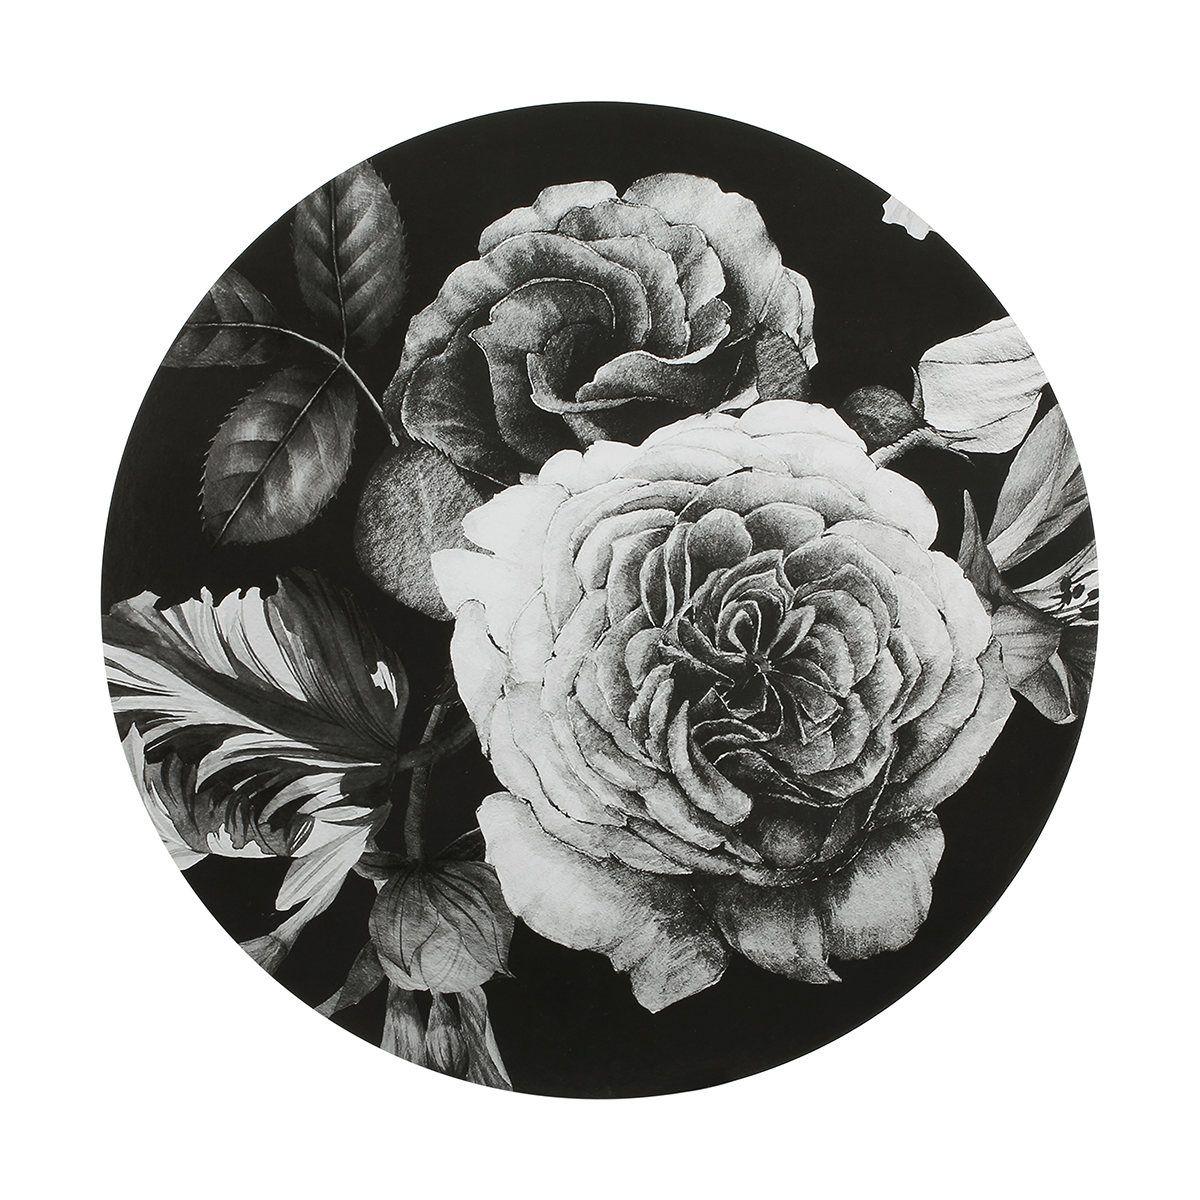 Floral Corkback Placemat Kmart Placemats Crockery Tableware